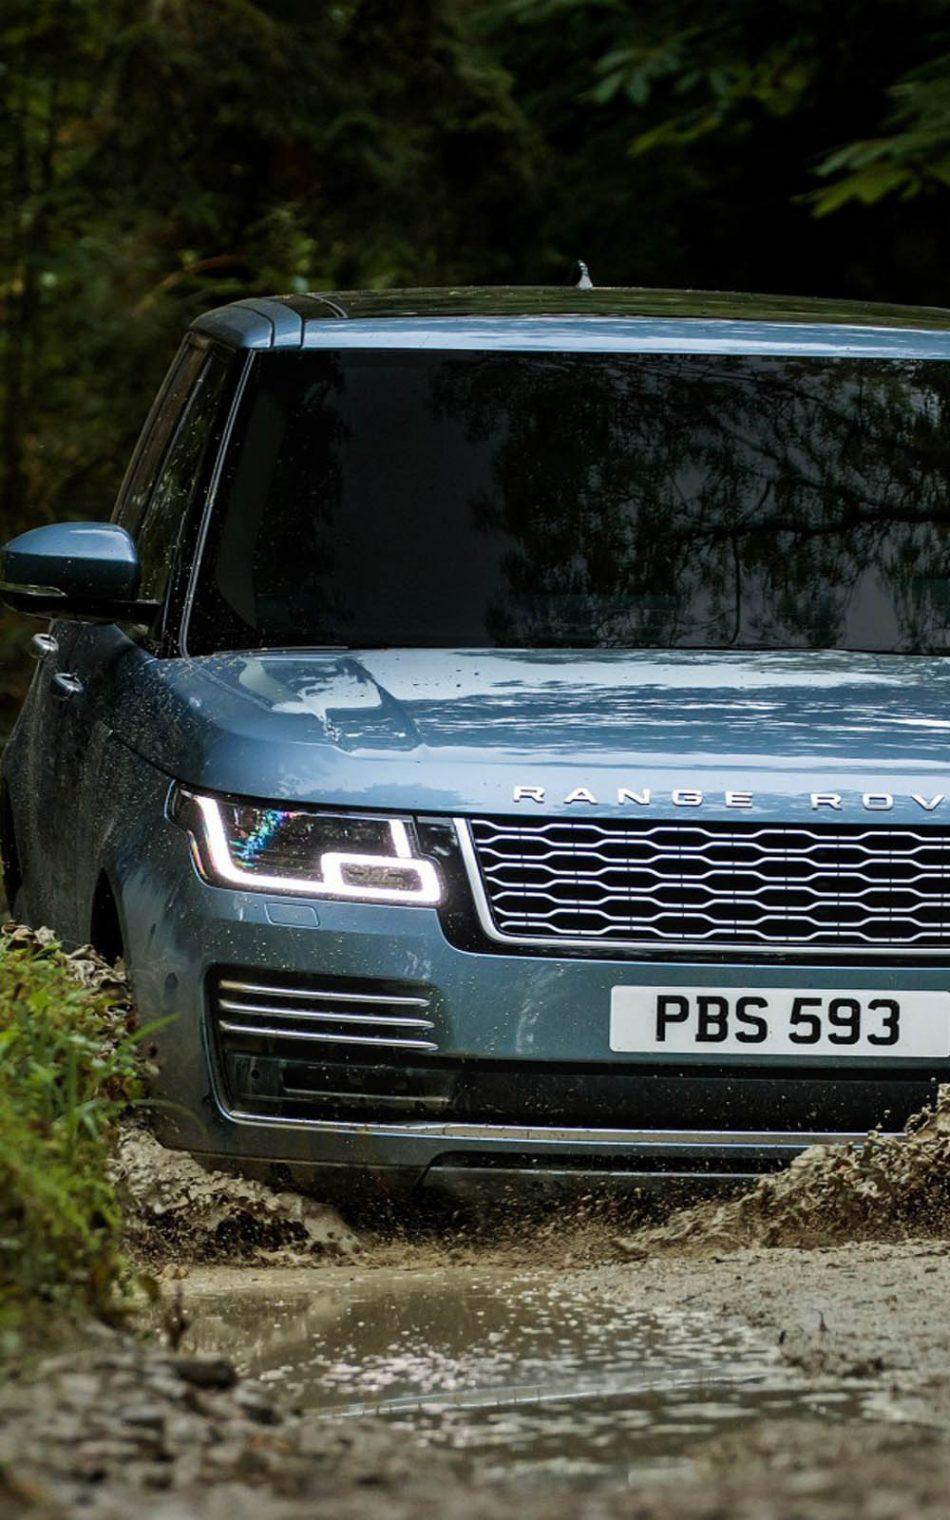 Range Rover Autobiography 2017 4k Ultra Hd Mobile Wallpaper